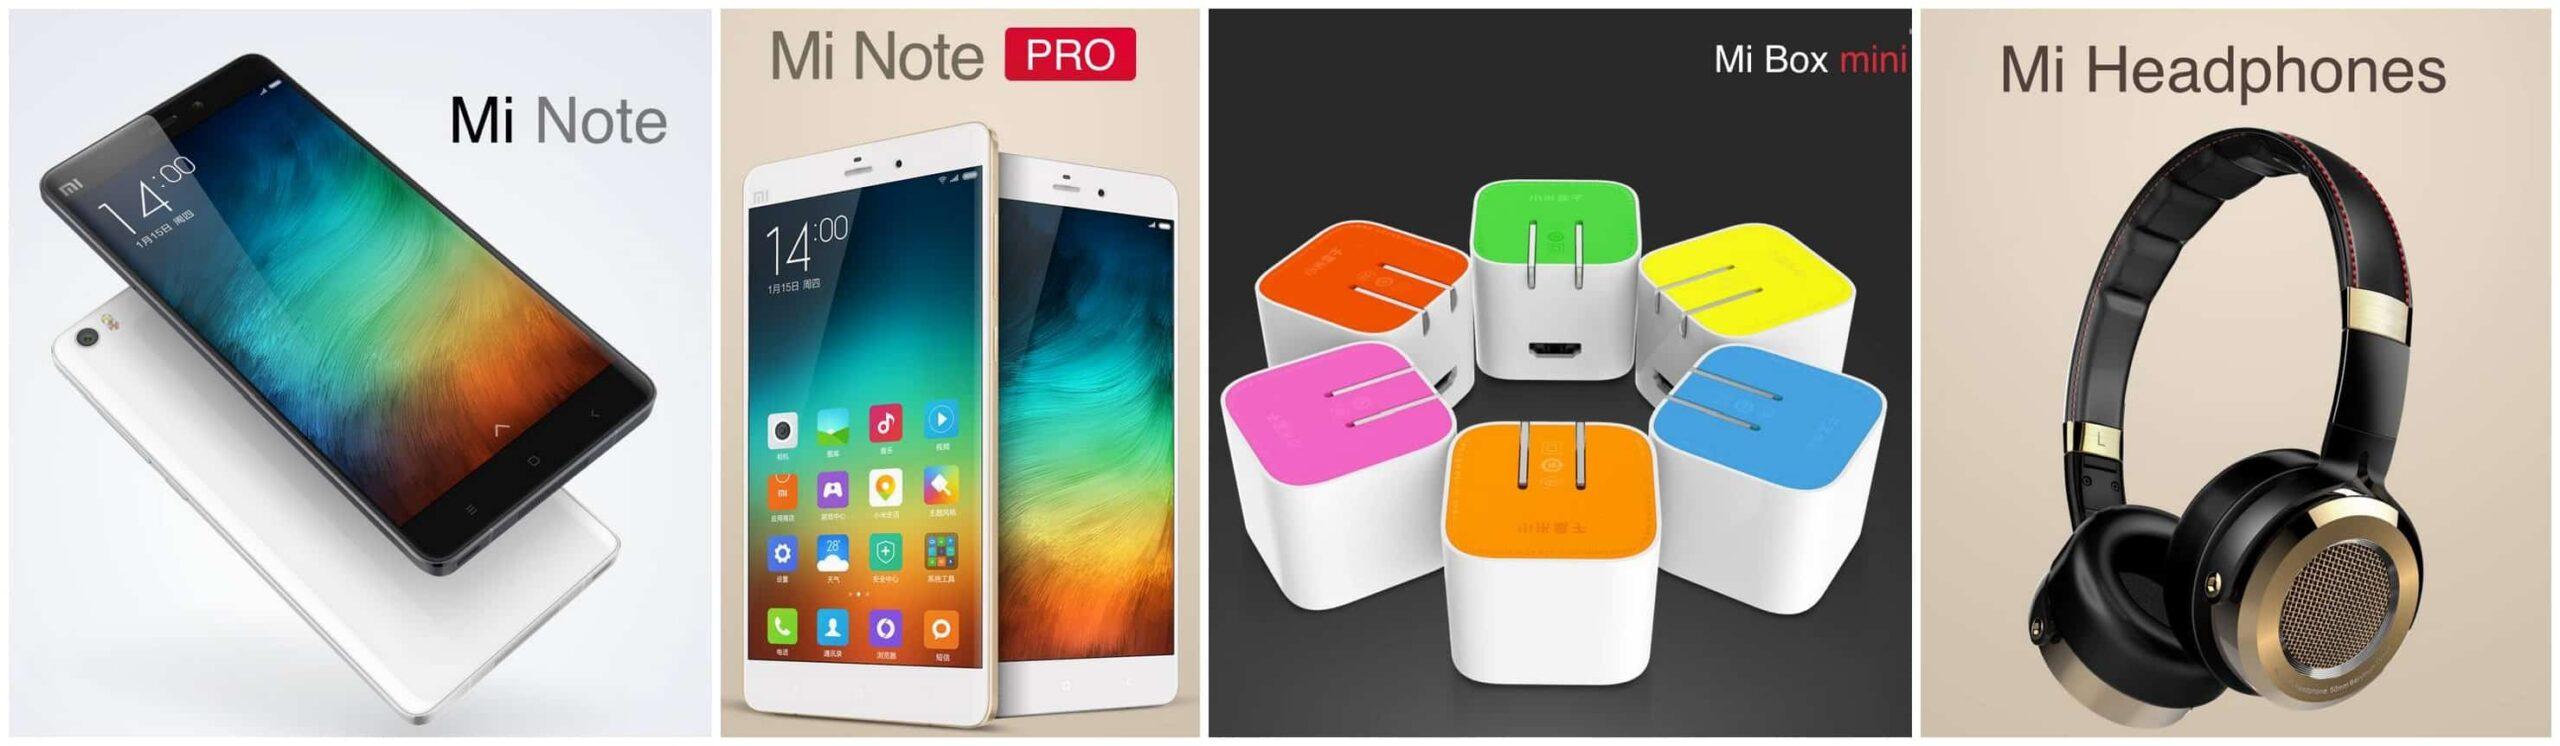 Xiaomi Introduces Mi Note, Mi Note Pro, Mi Box Mini and Mi Headphones 1